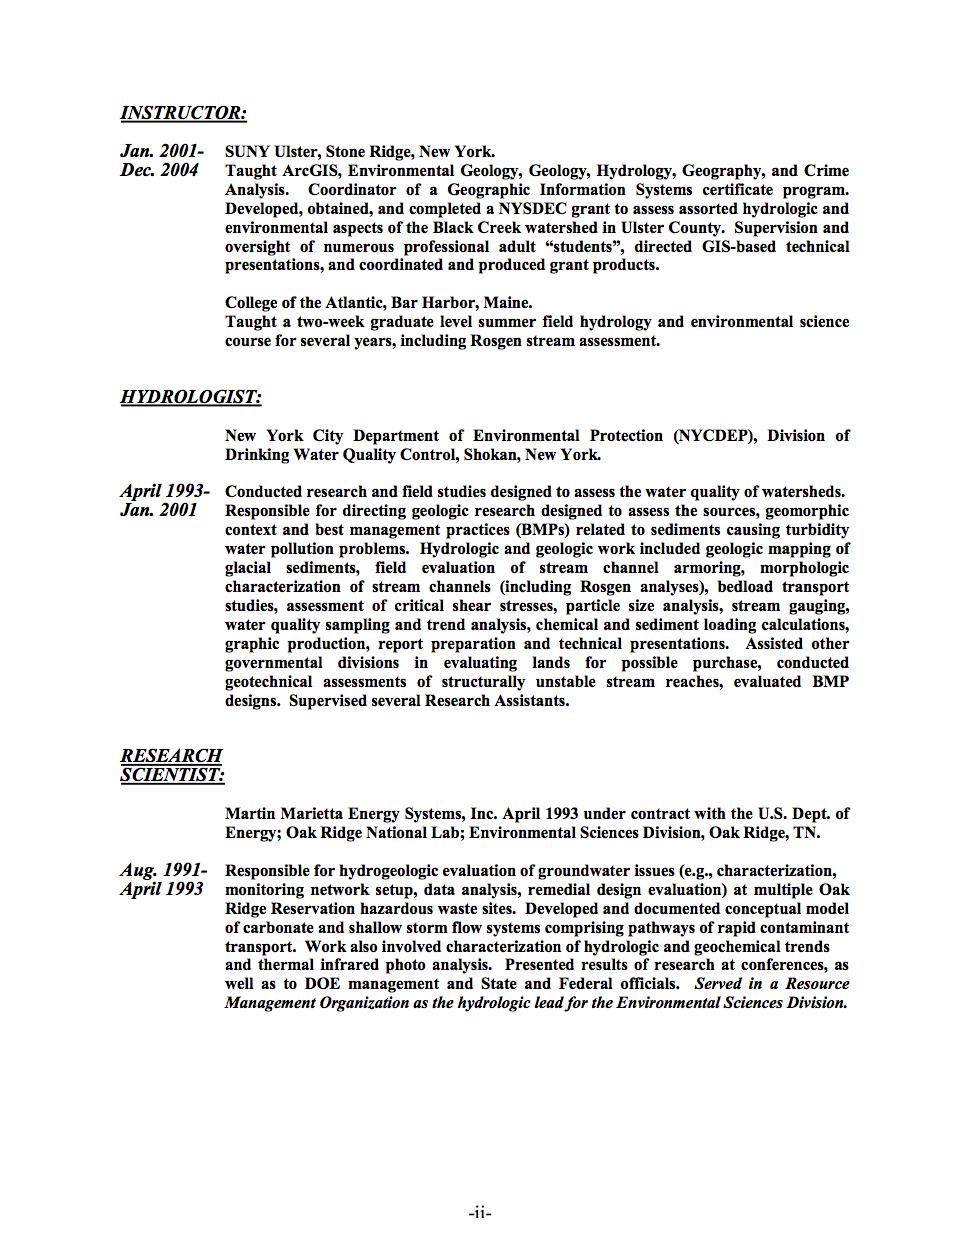 Mar 6, 2019 | Hydrologic Considerations Re  Global Partners